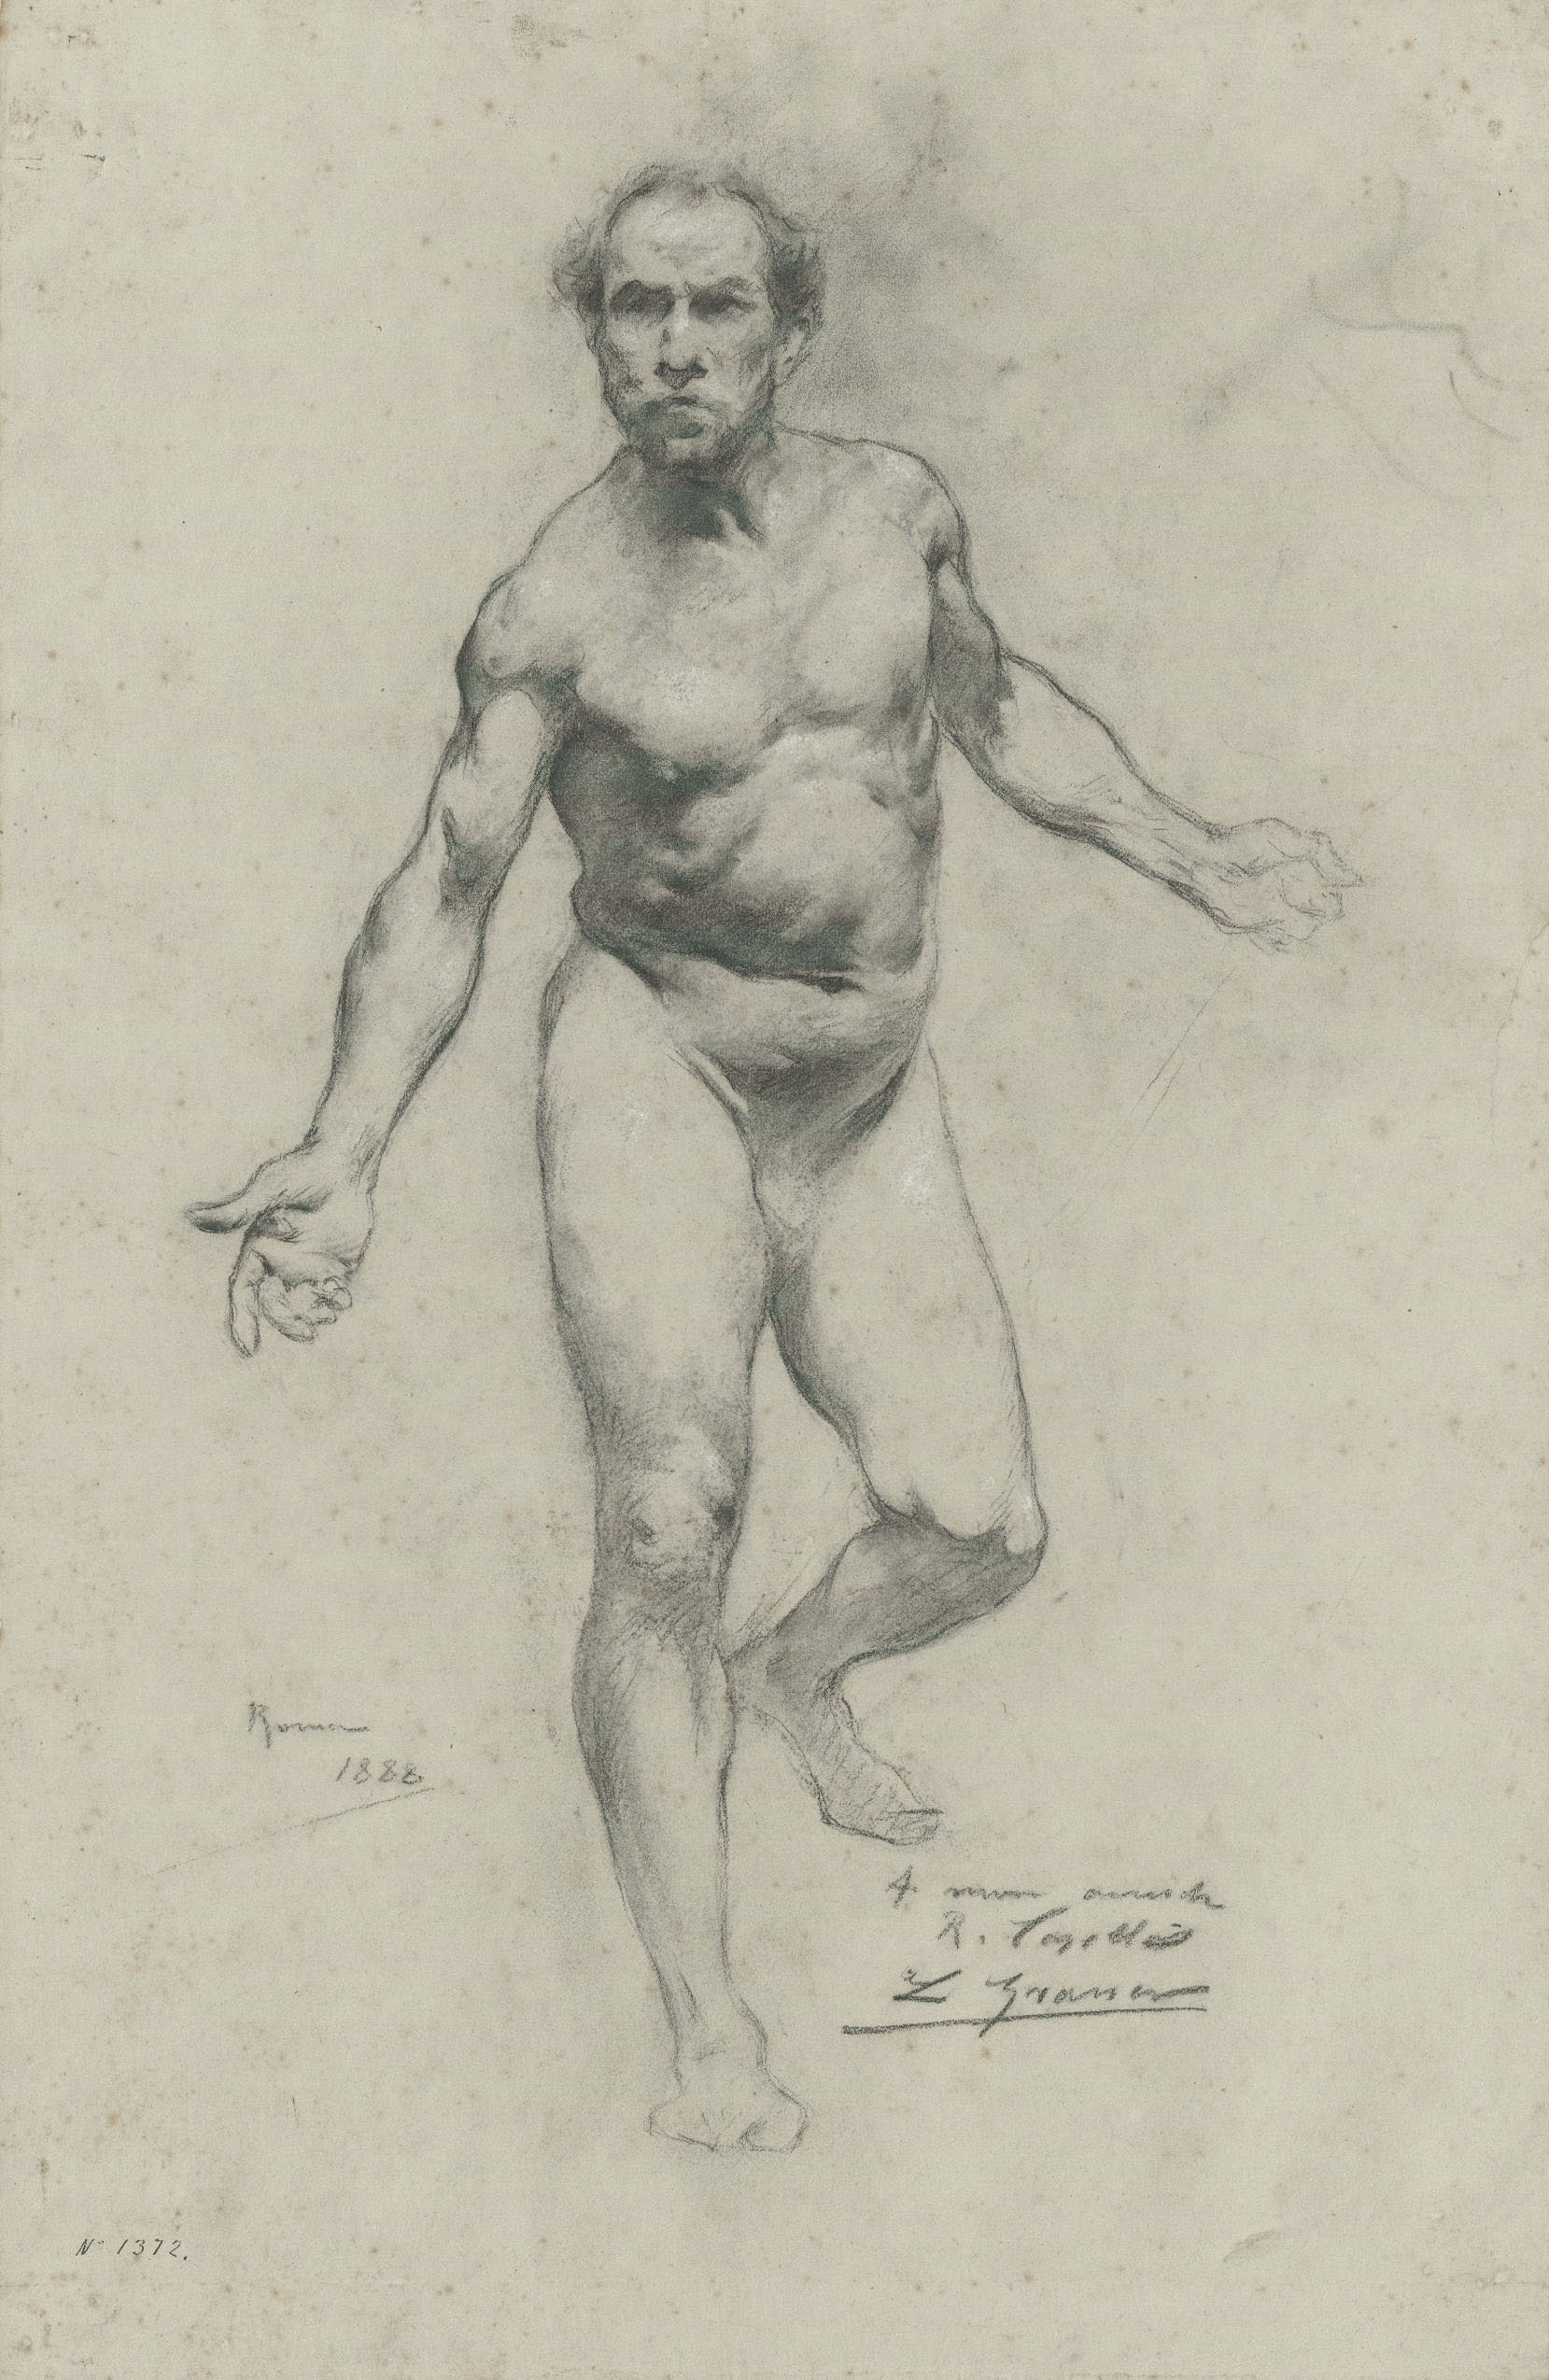 Lluís Graner - Estudi acadèmic d'un nu masculí - Roma, 1888